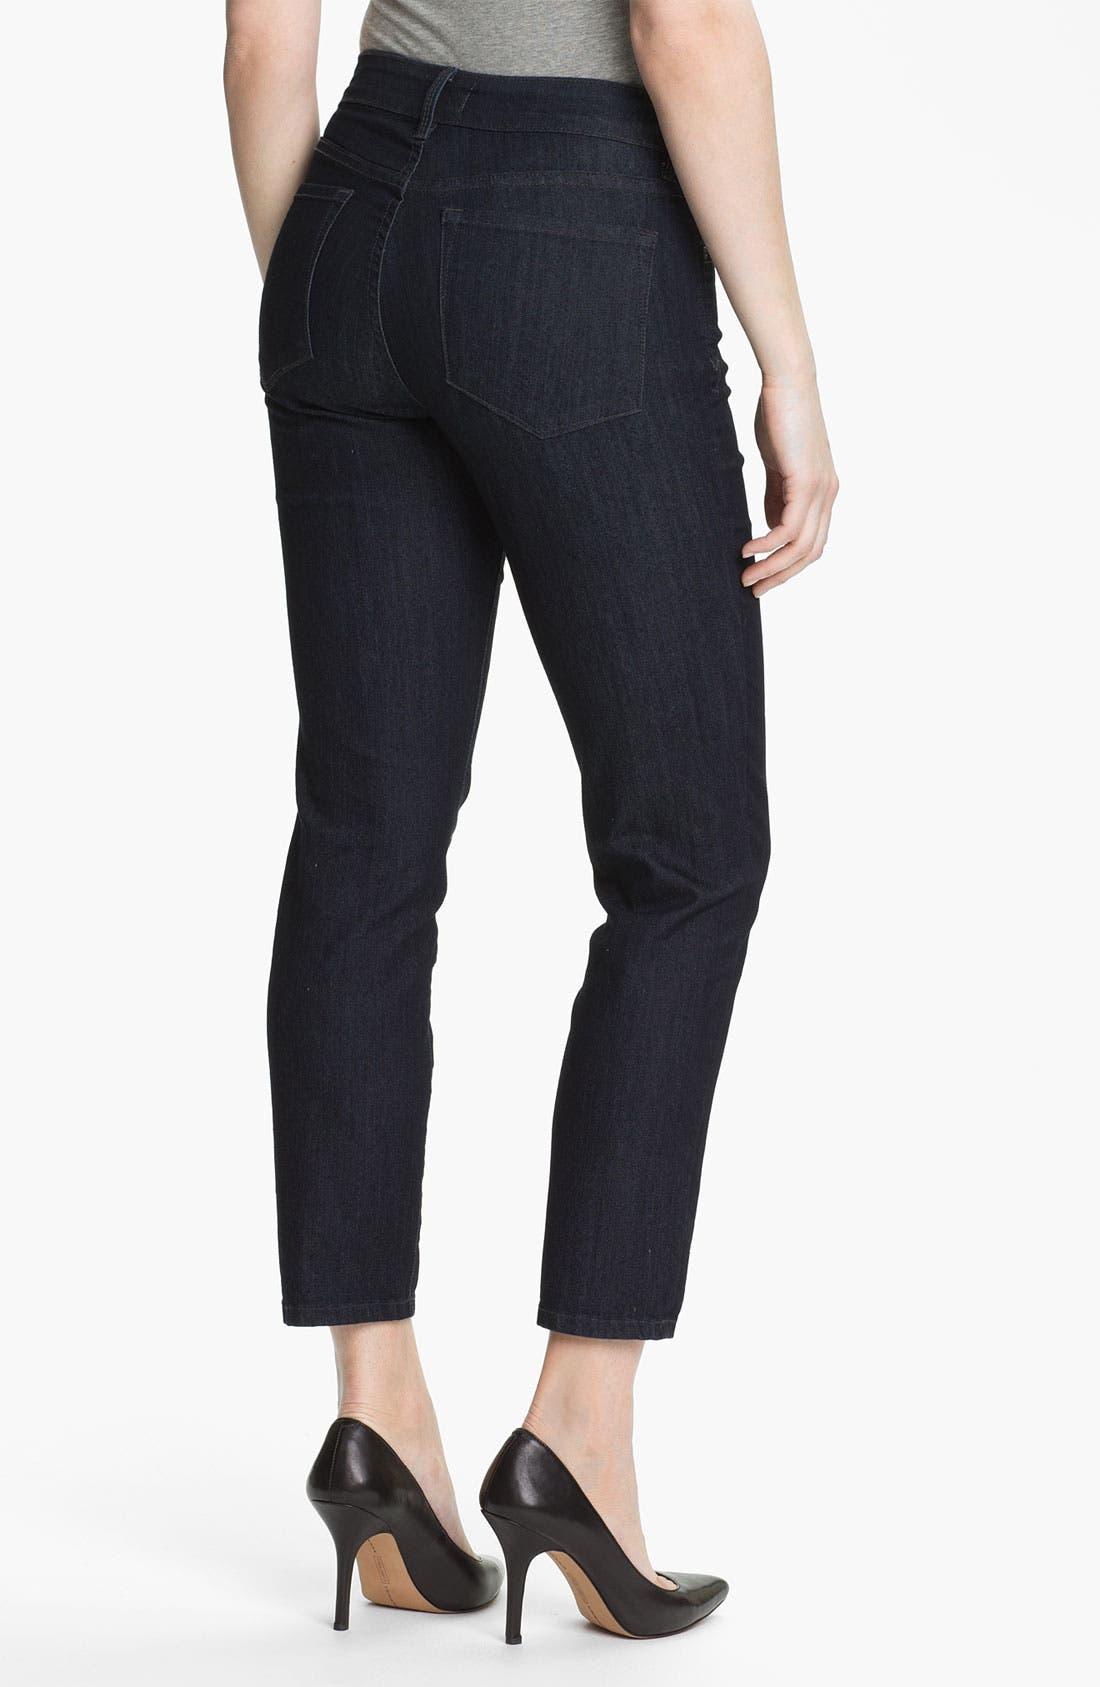 Alternate Image 2  - NYDJ 'Alisha' Stretch Skinny Jeans (Petite)